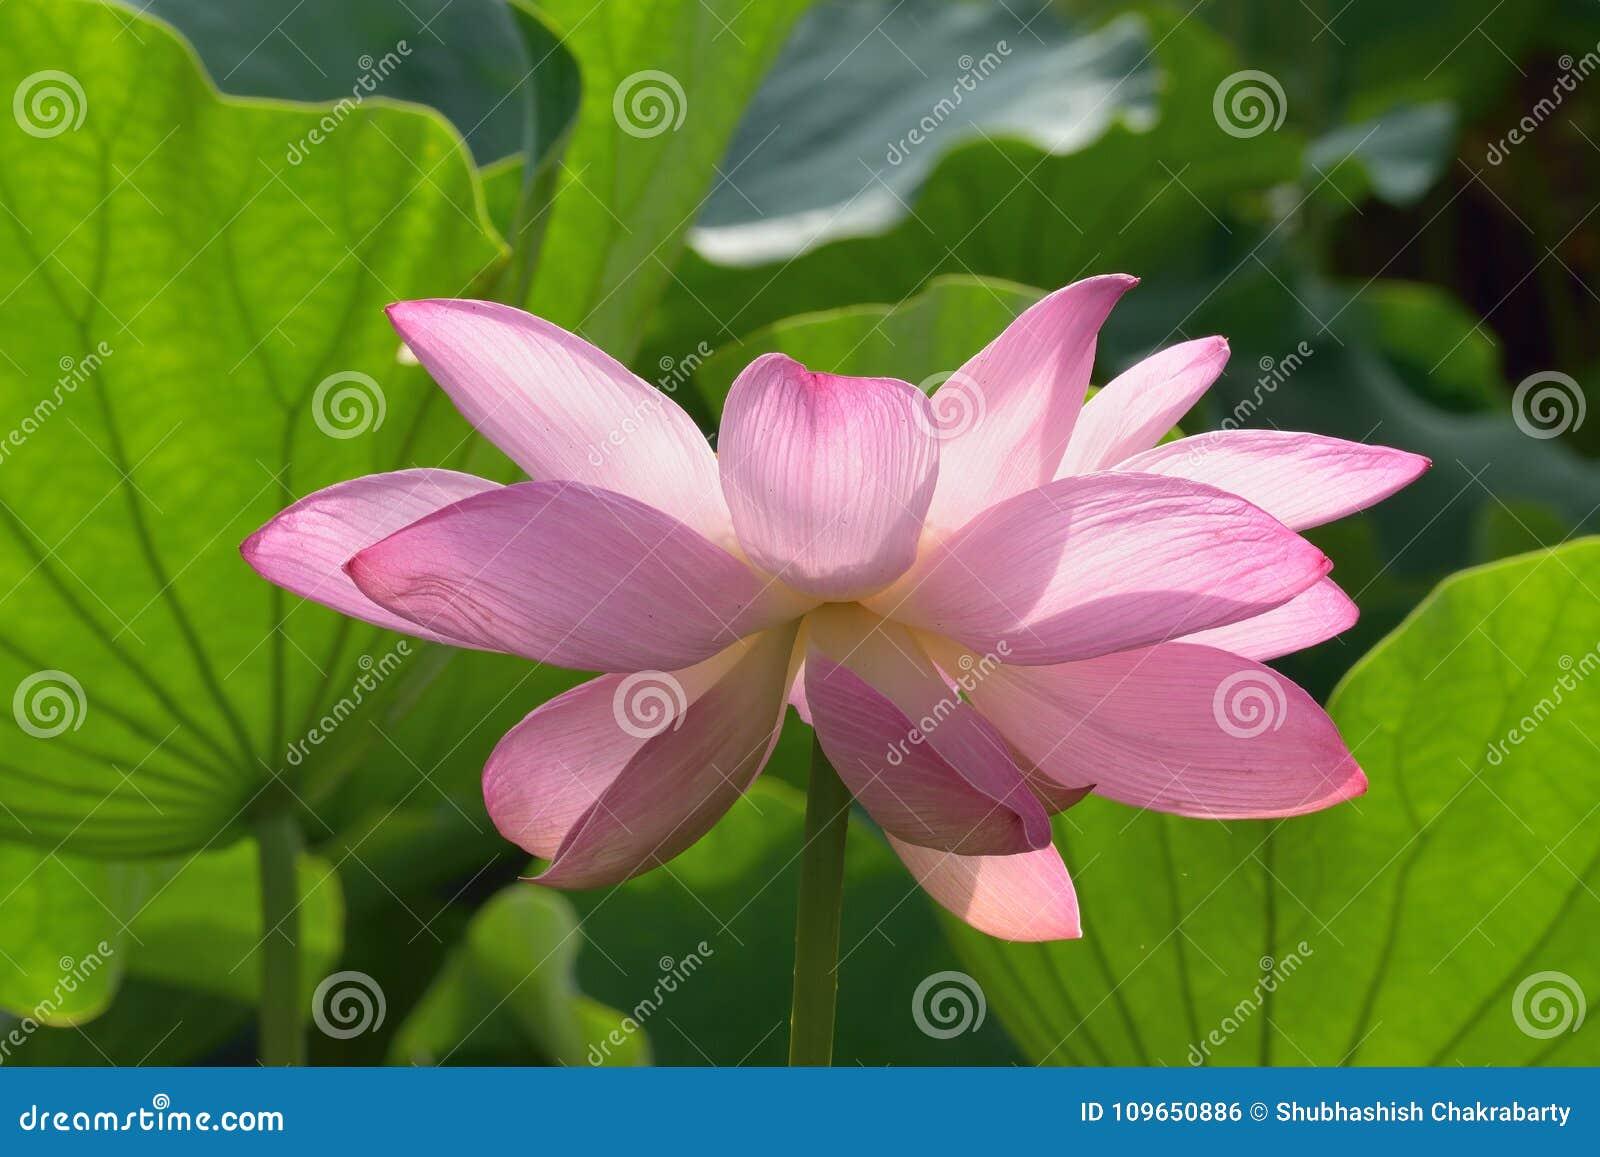 Macro details of japanese pink lotus flowers at garden stock photo download macro details of japanese pink lotus flowers at garden stock photo image of color izmirmasajfo